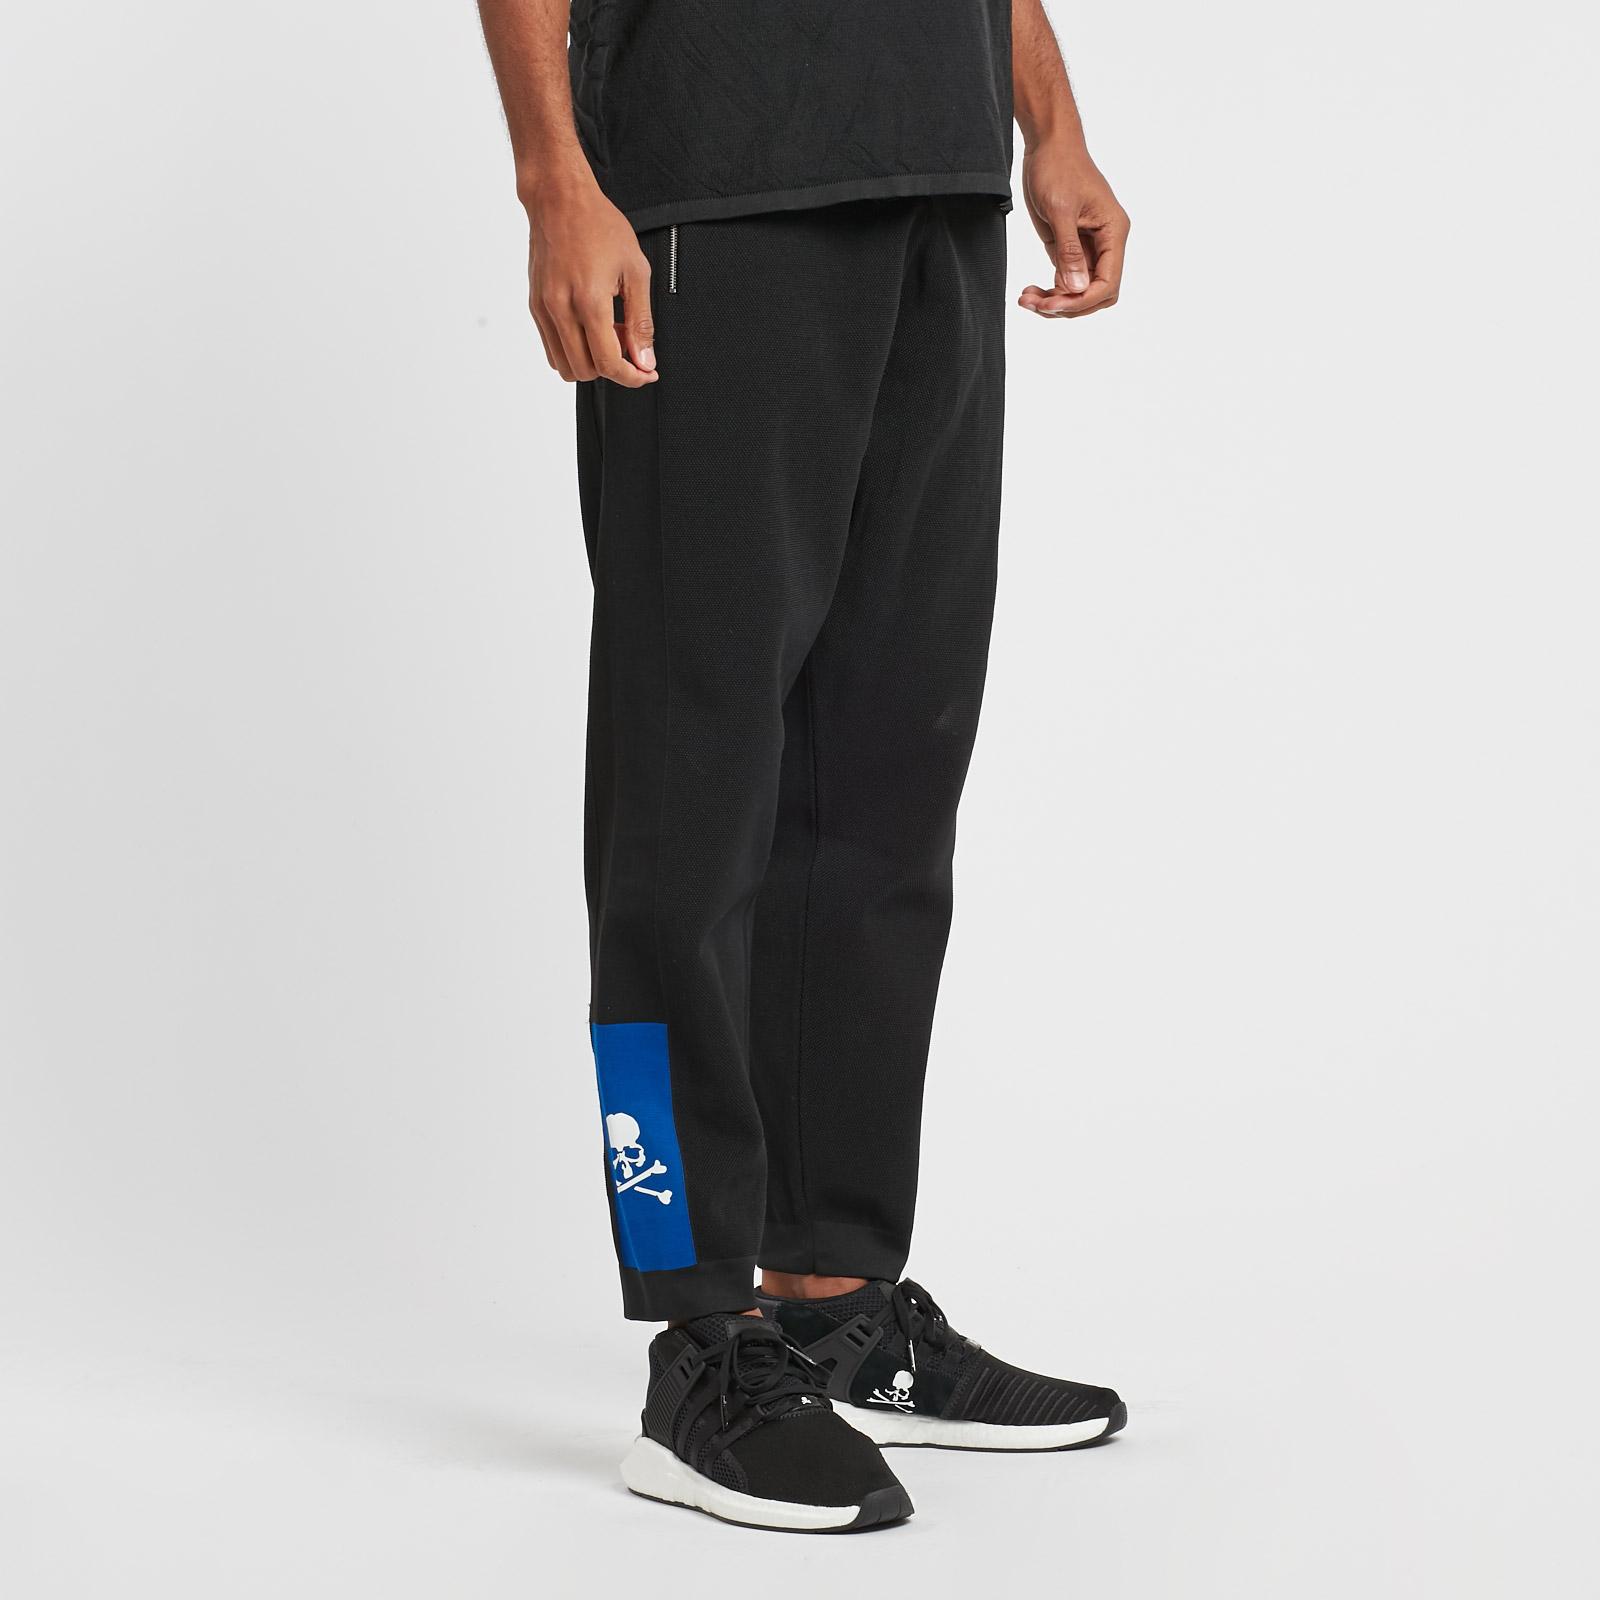 adidas Track Pant by Mastermind World Cg0755